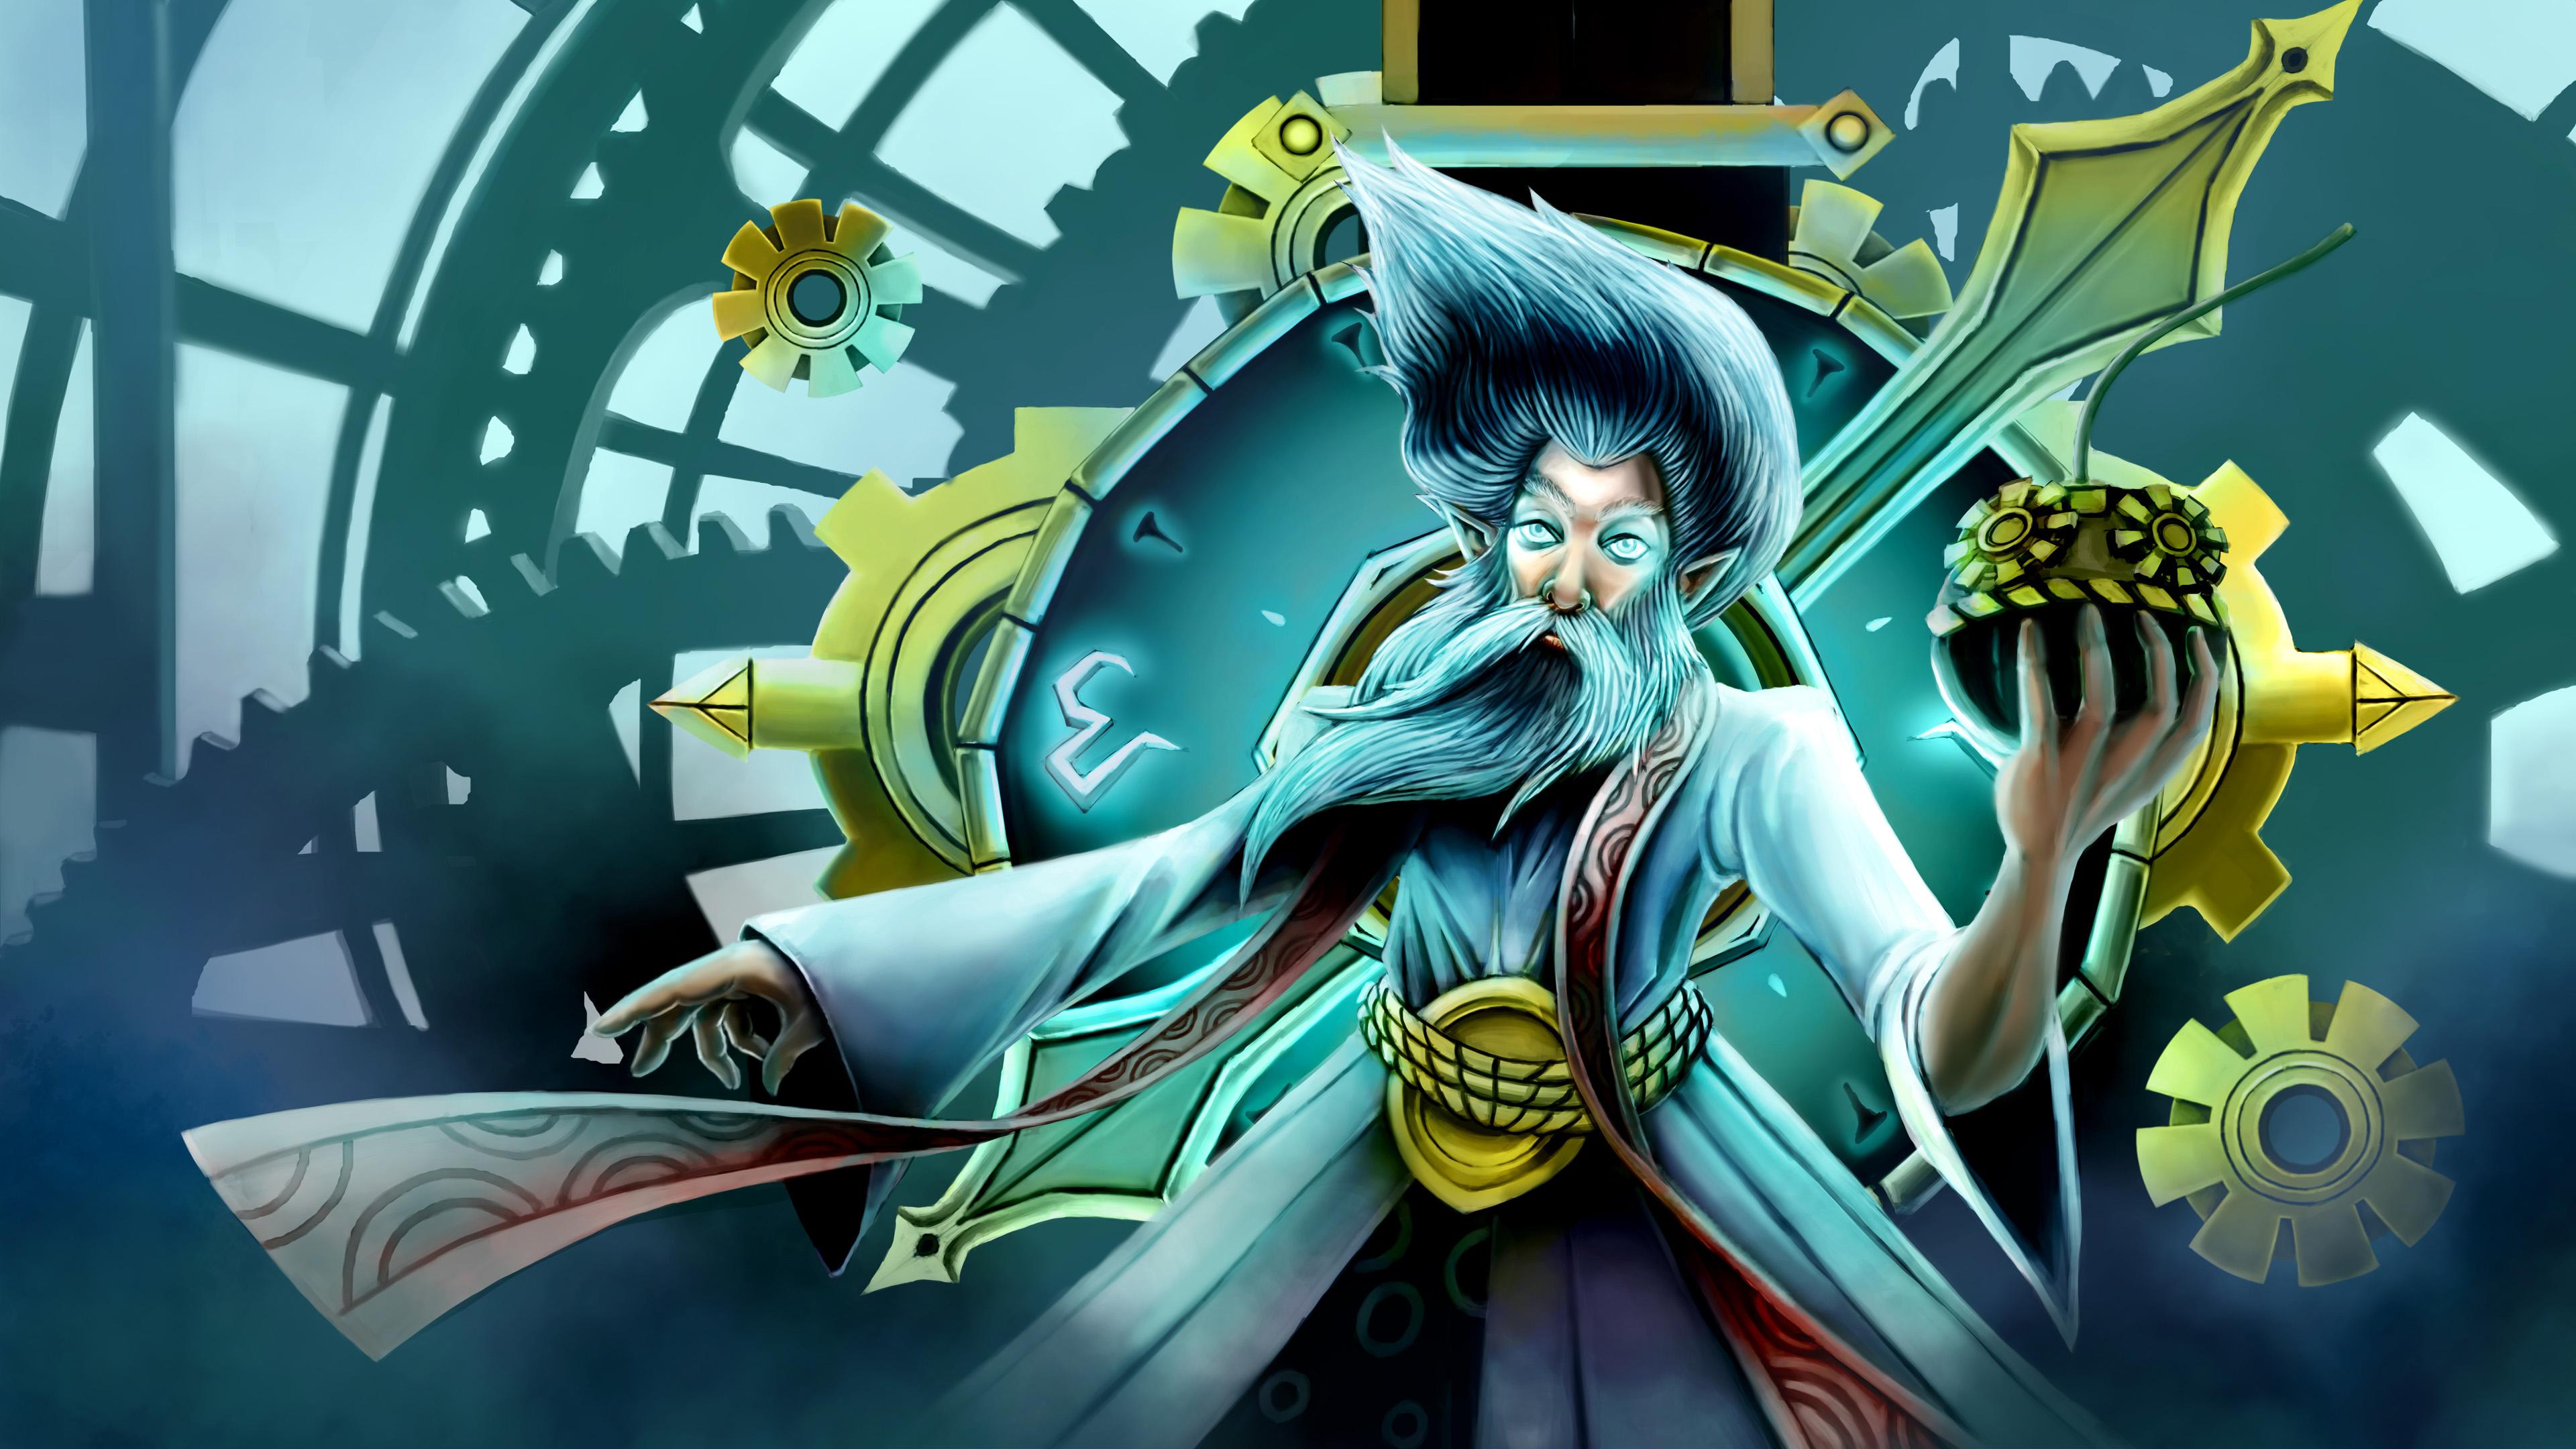 World Of Warcraft Wallpaper Hd Video Game League Of Legends Zilean The Chronokeeper Mage